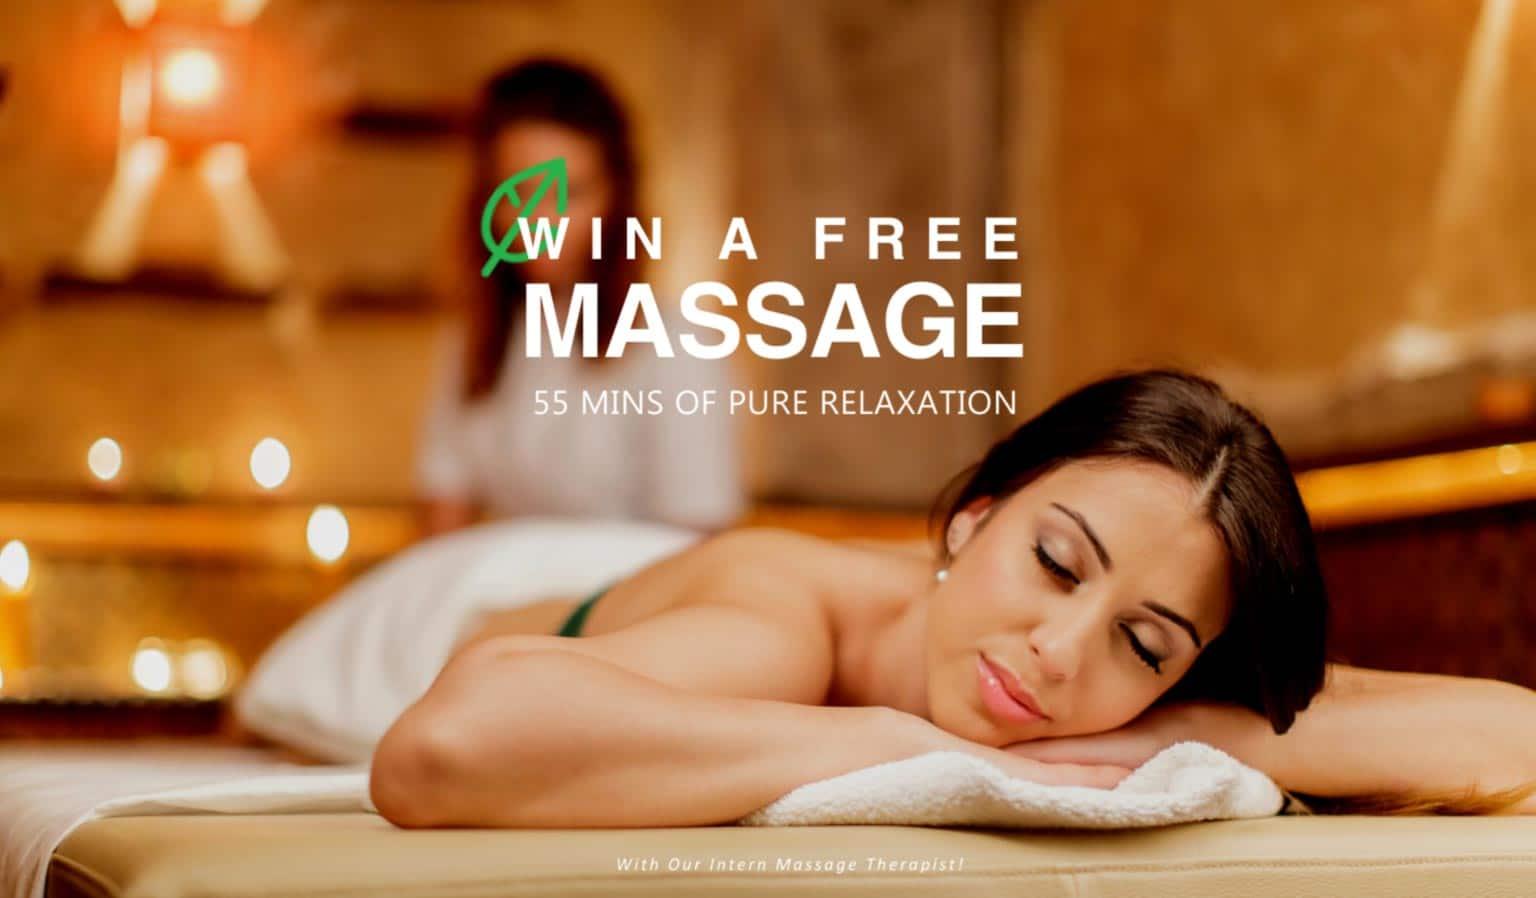 Massage-Giveaway